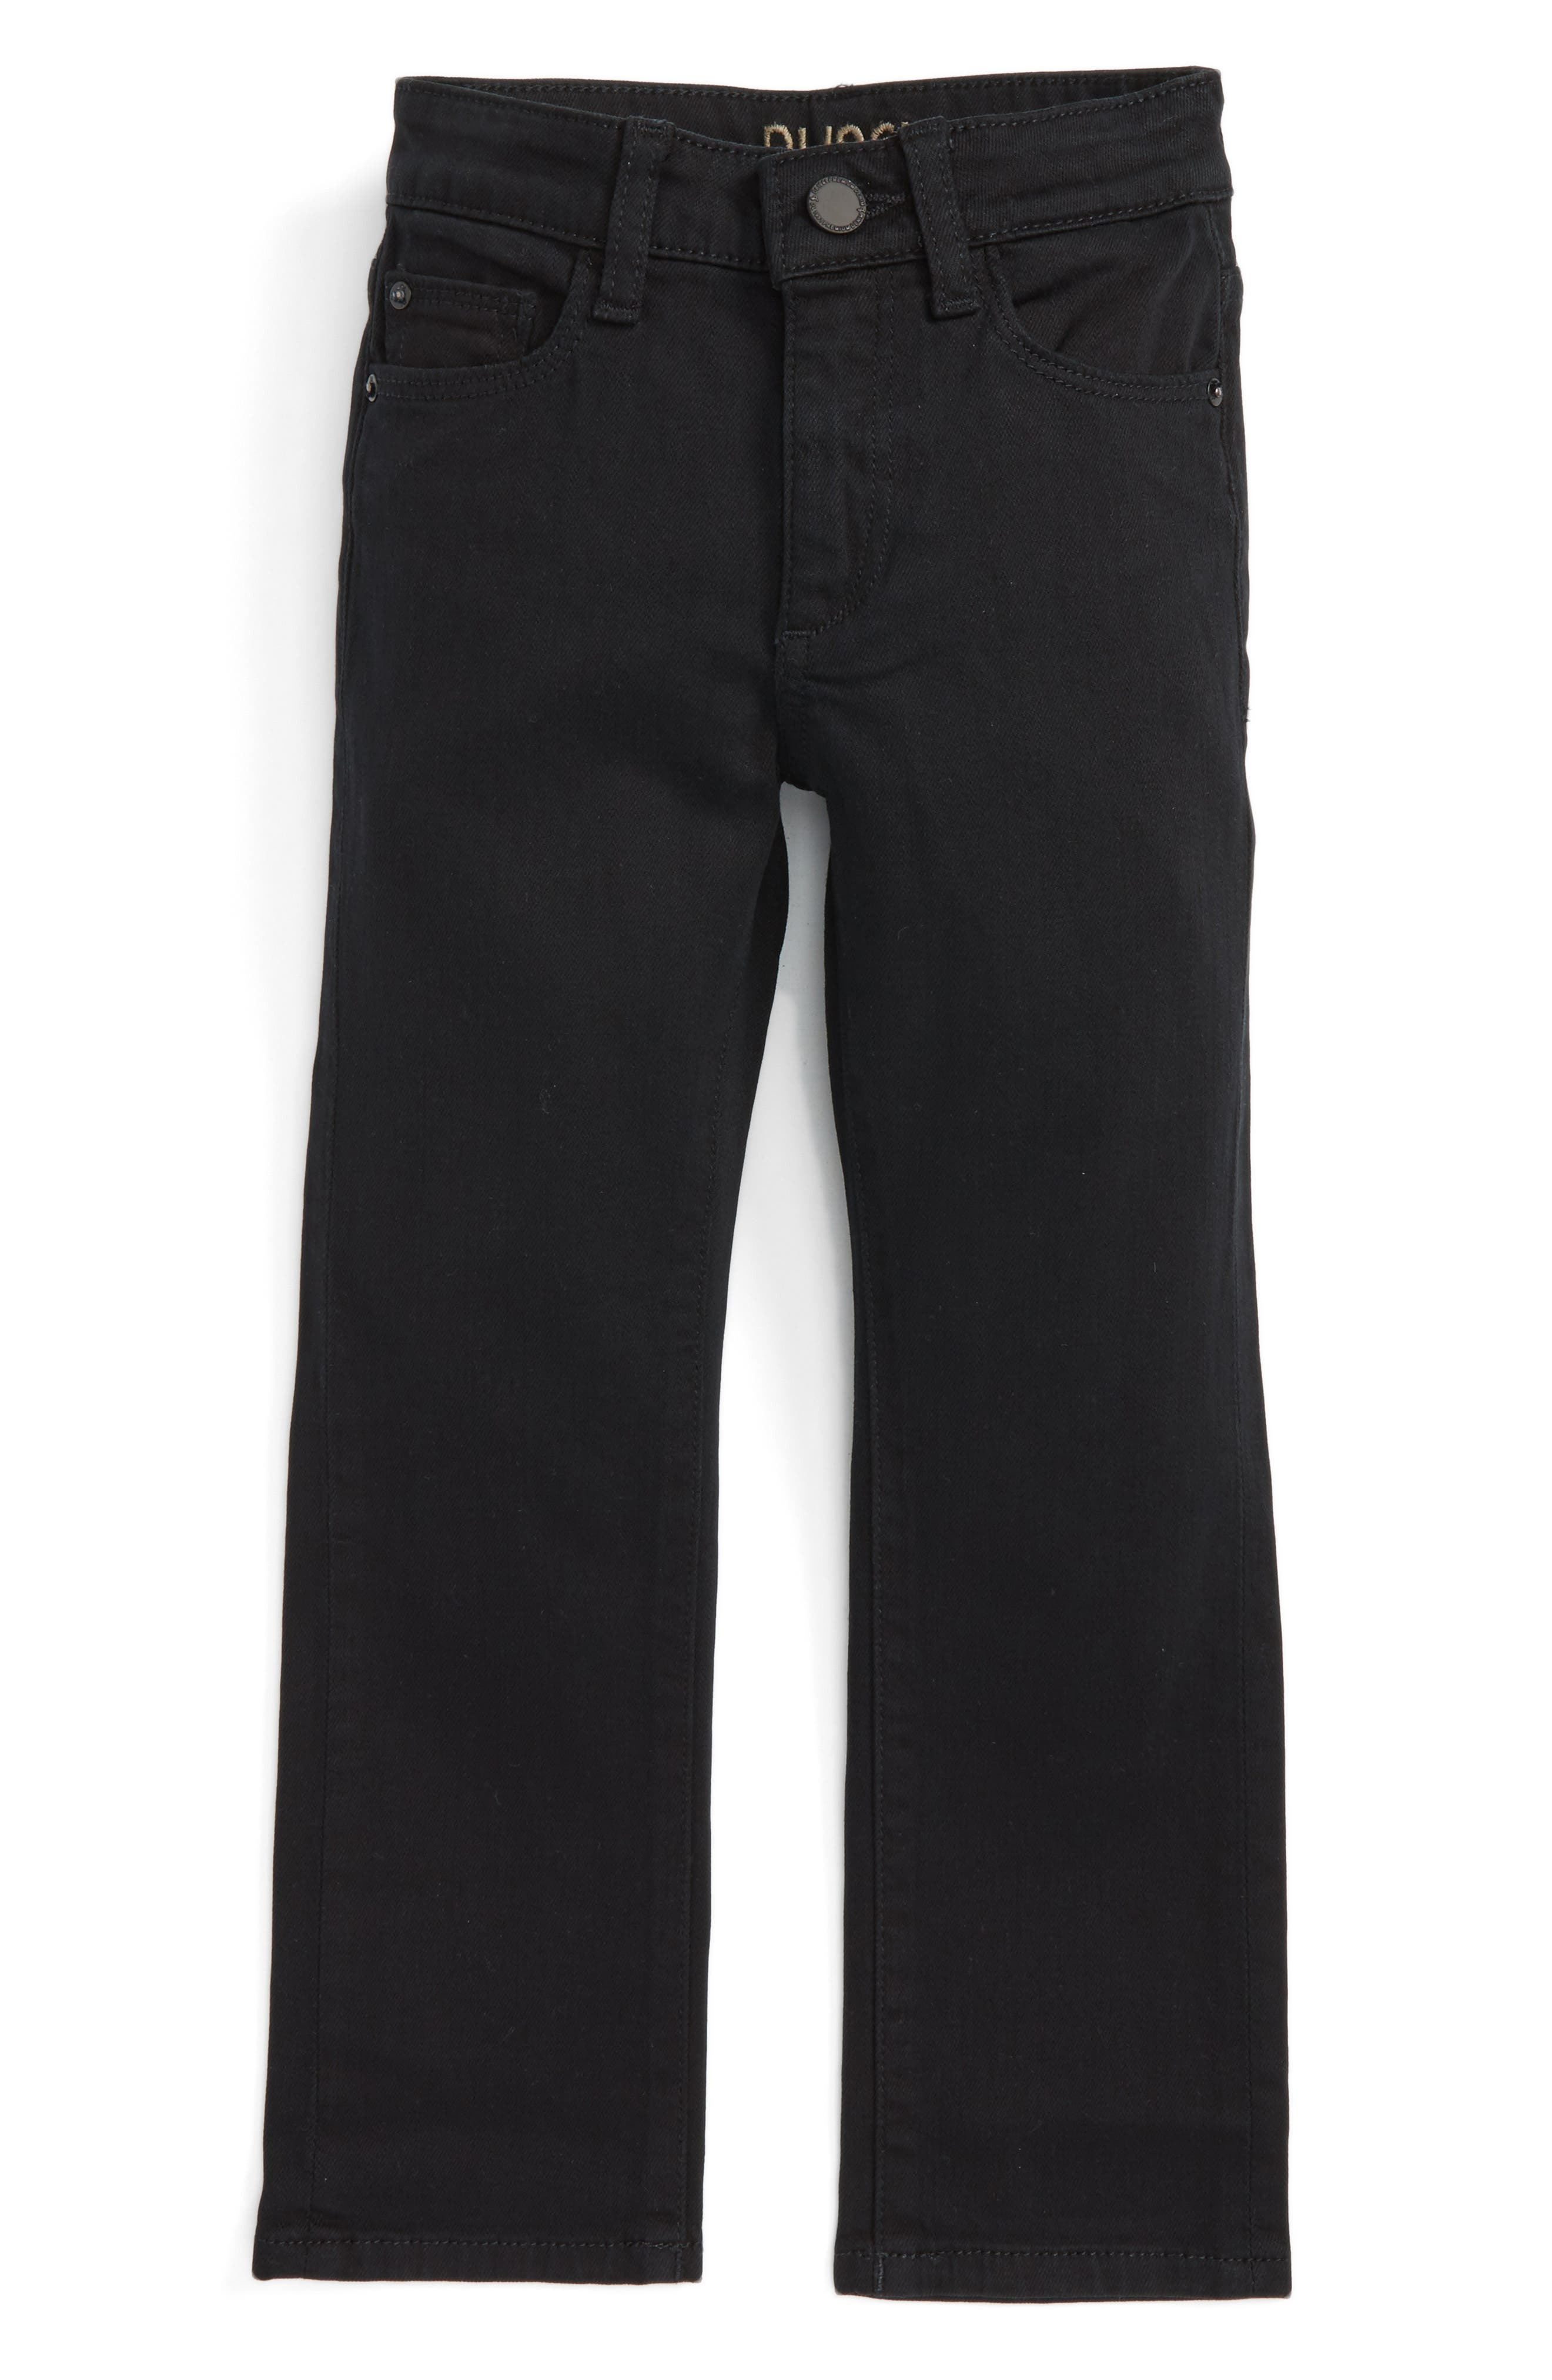 Alternate Image 1 Selected - DL1961 'Brady' Slim Fit Jeans (Toddler Boys & Little Boys)